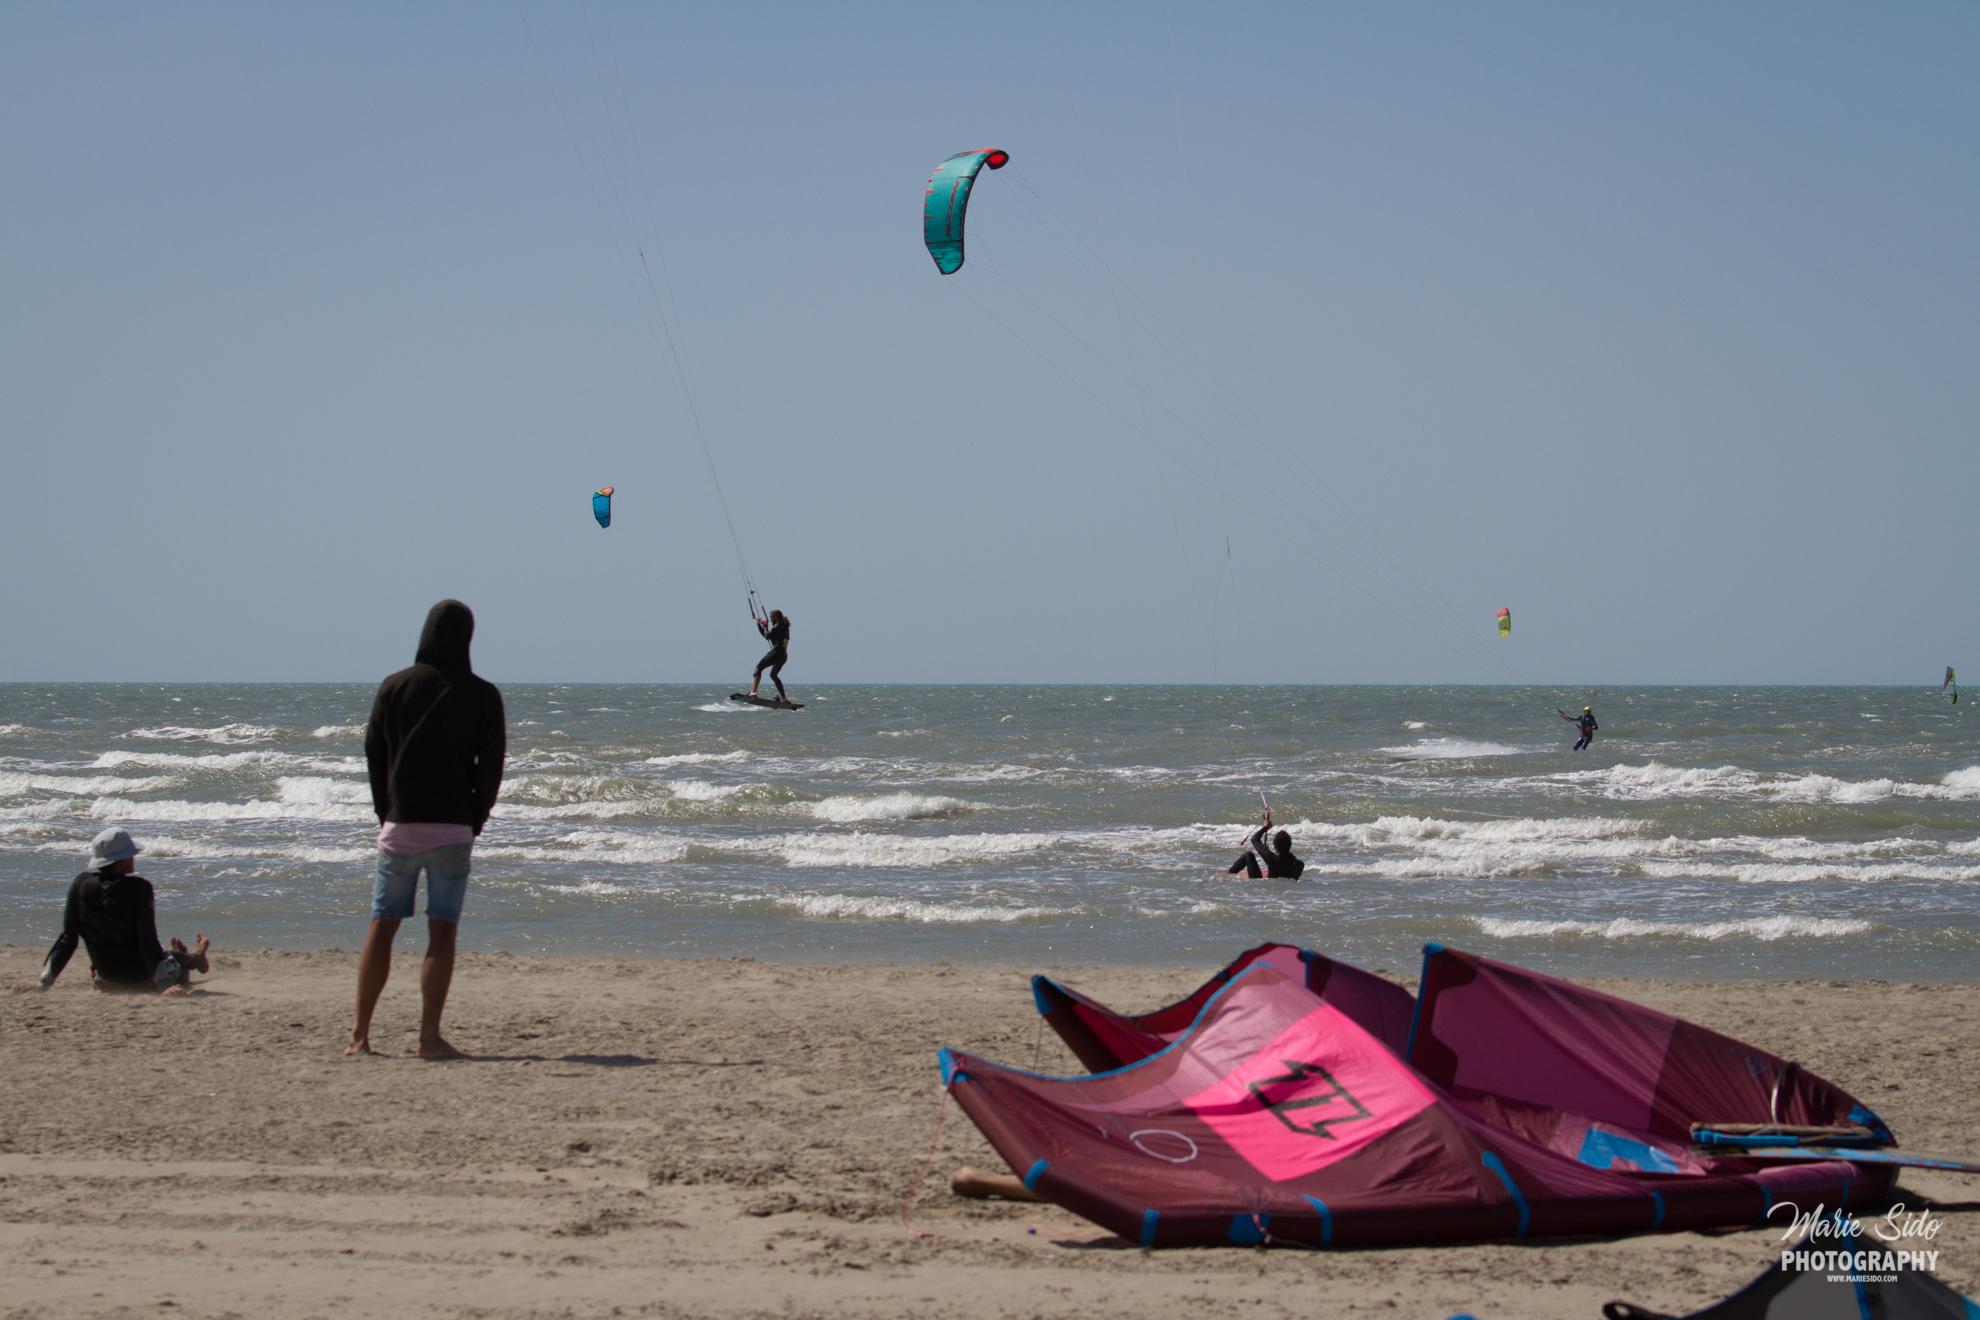 Beauduc Kitesurfing, vanlife en nature, Mari Sido photography